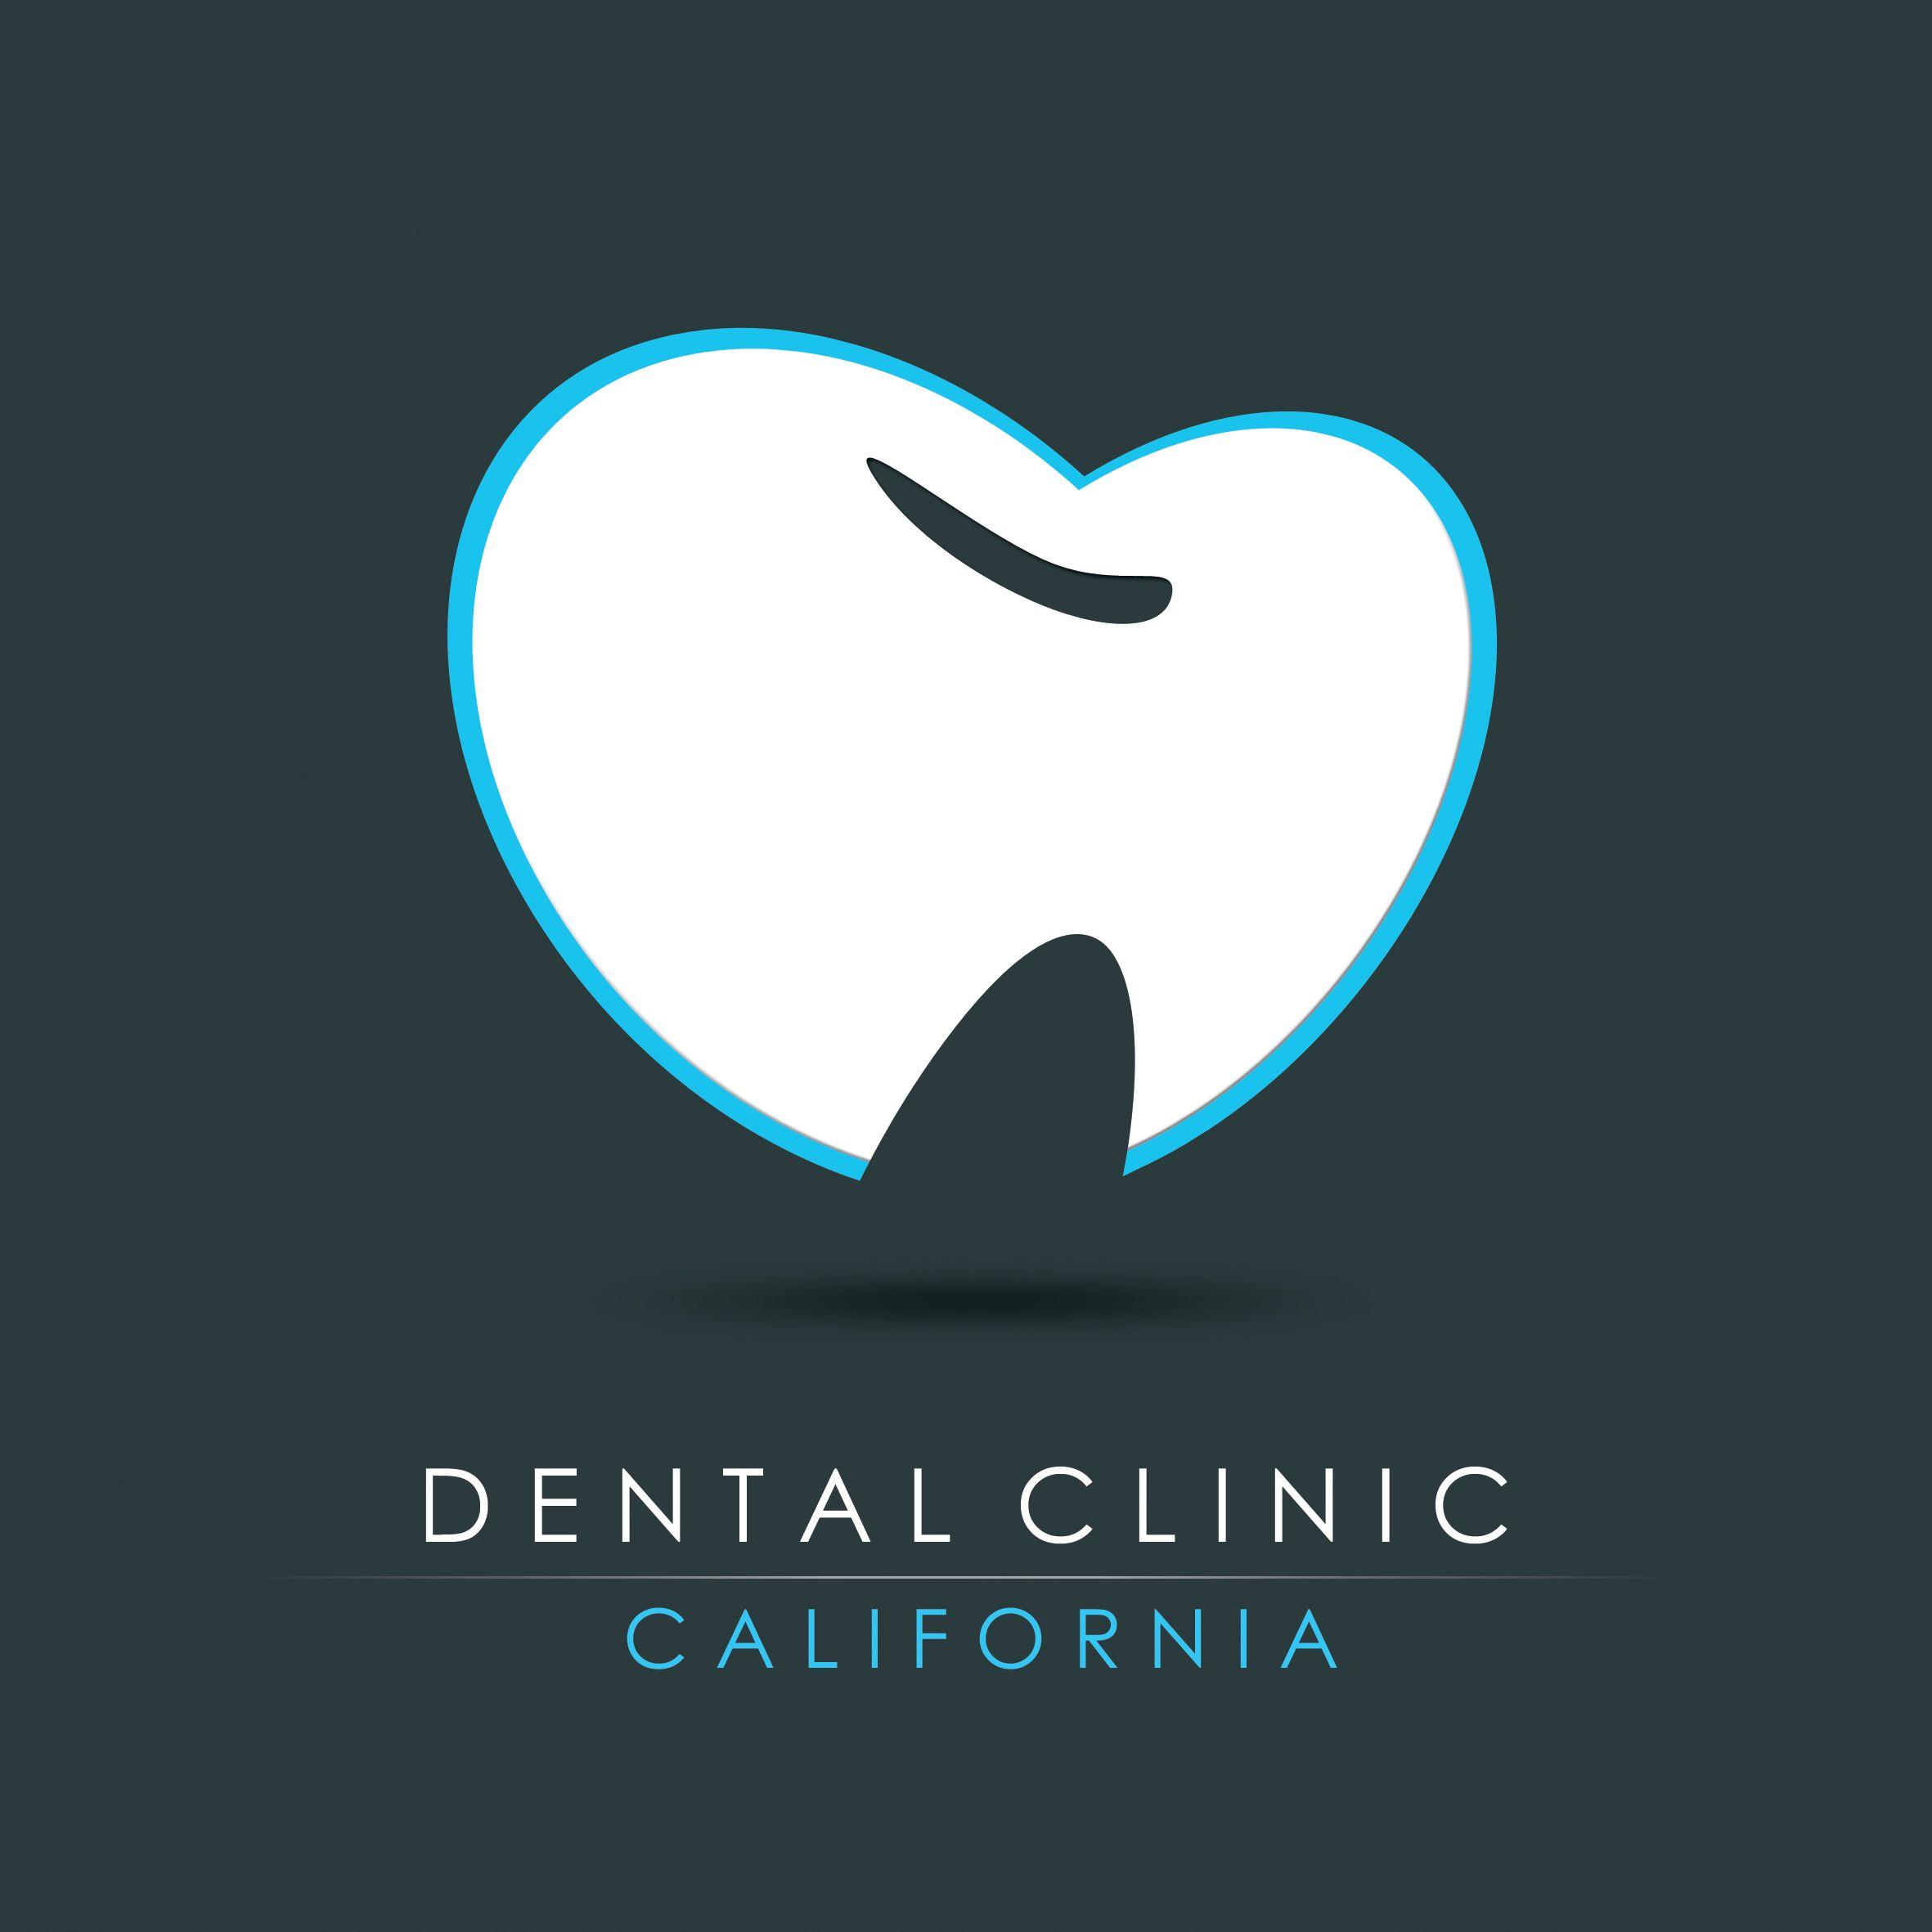 Dental Clinic California